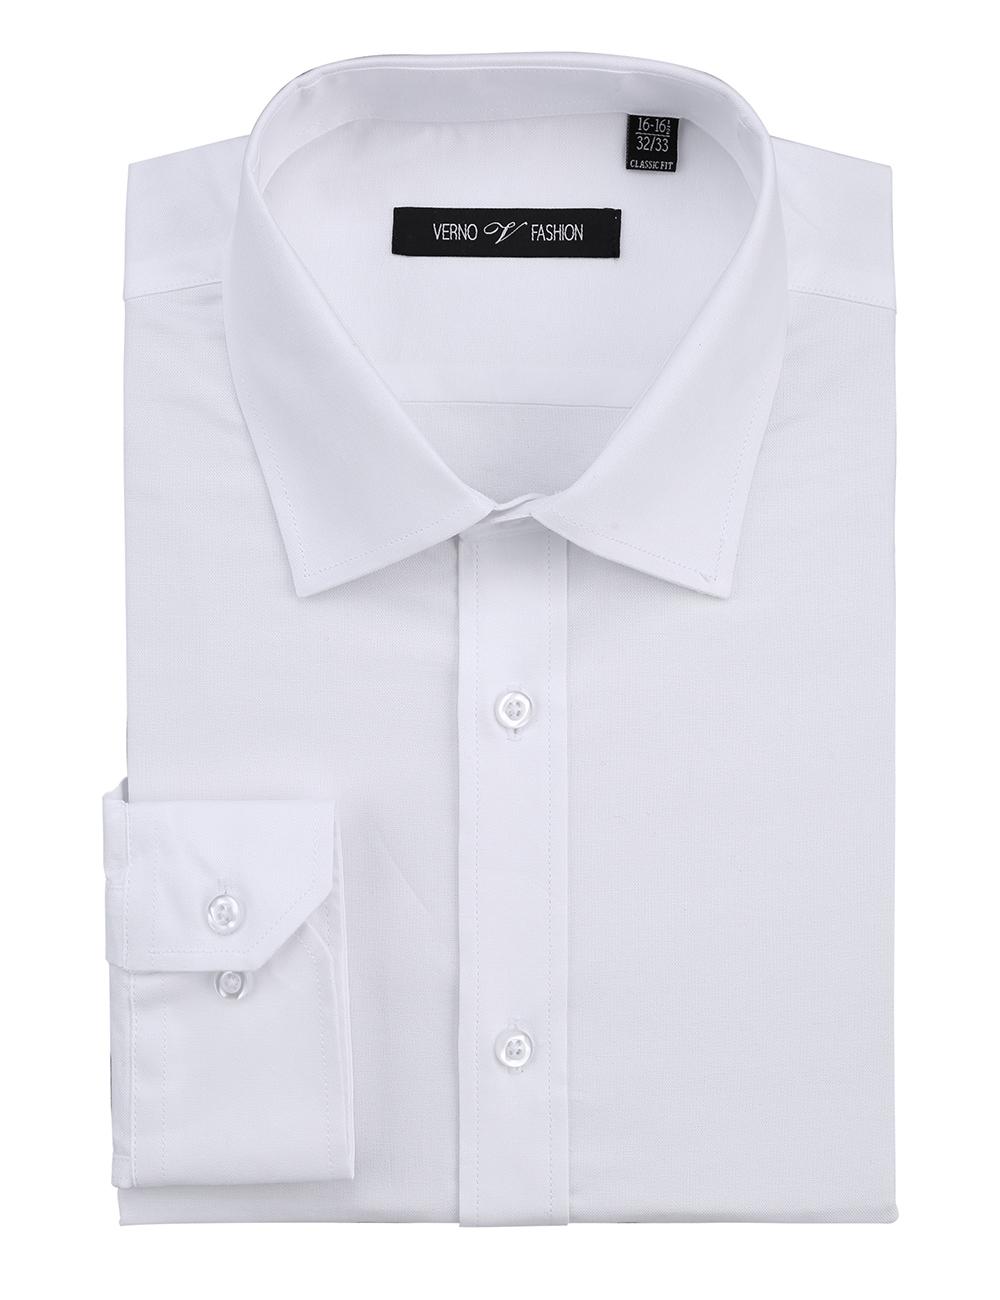 Casual King Mens Dress Shirts Wrinkle-Free Regular Fit Long Sleeve Fashion Men Shirt